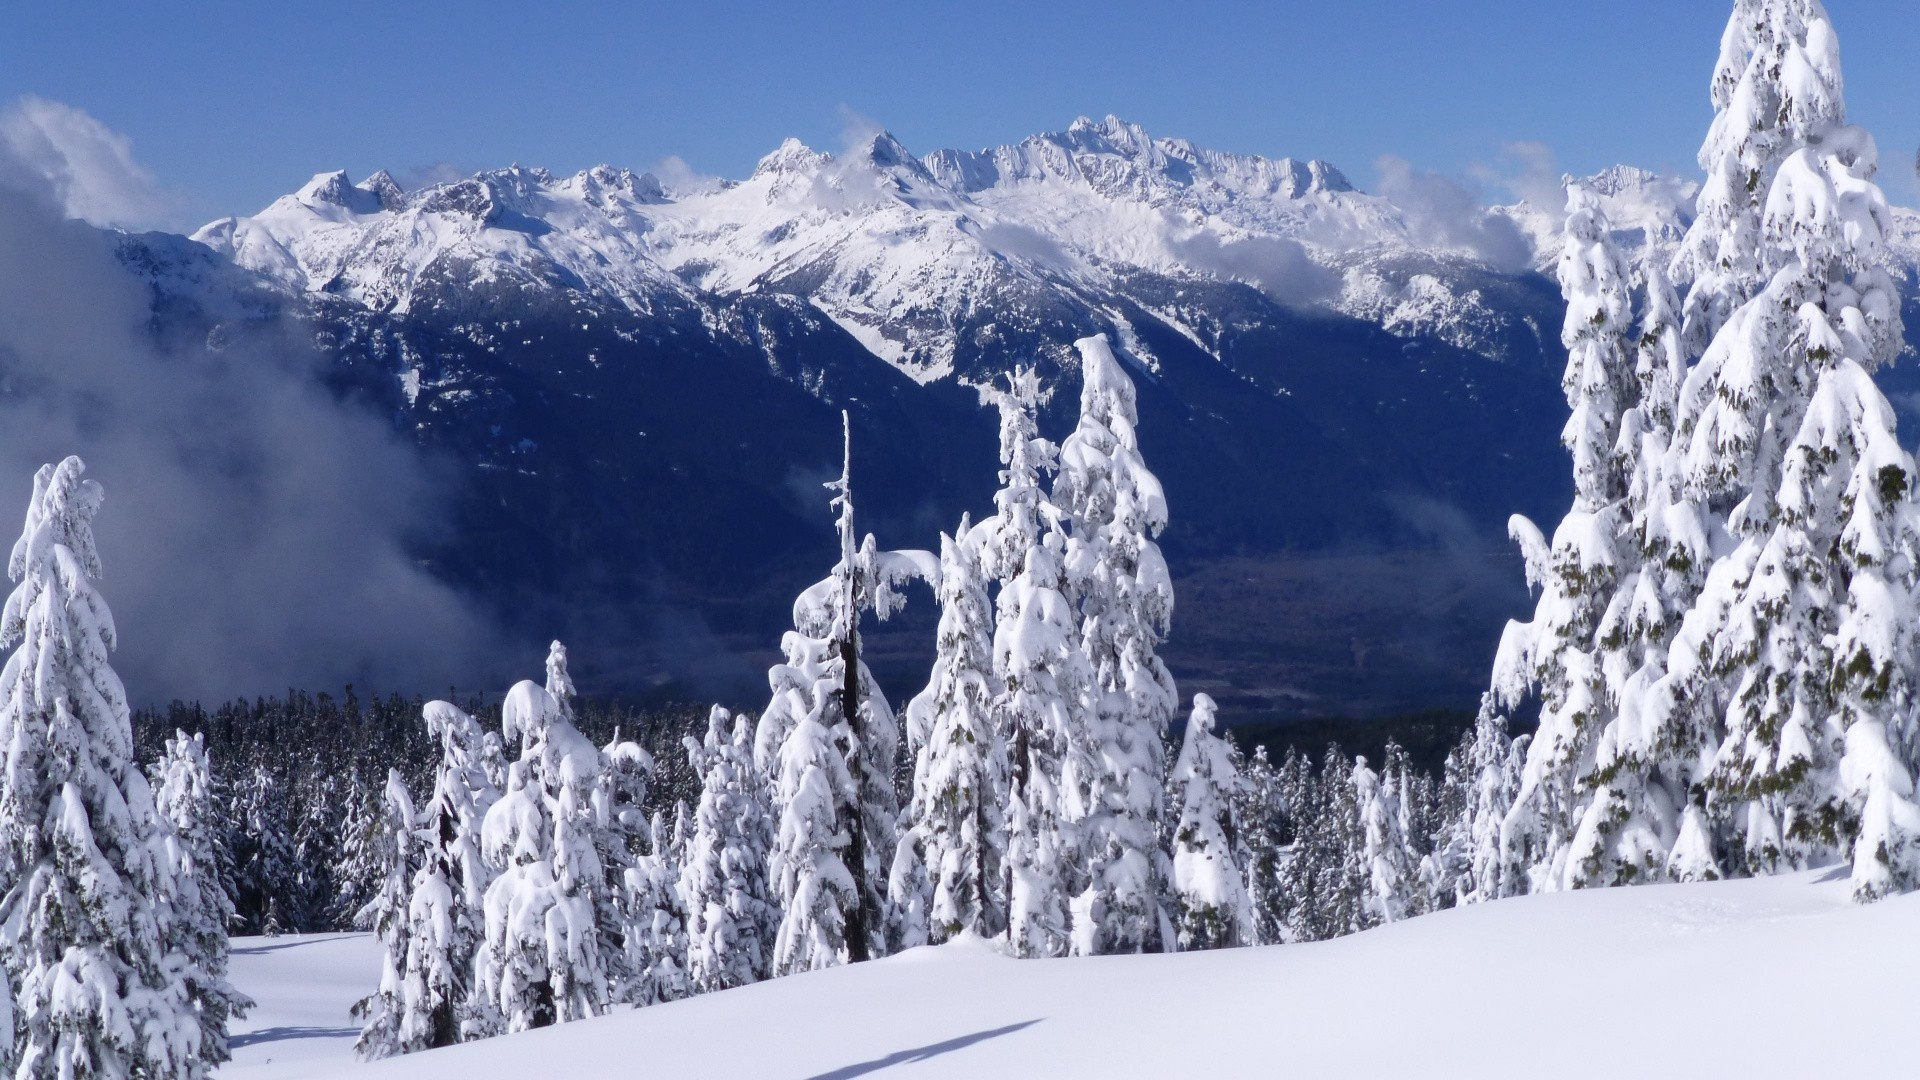 Snow Mountain Background Wallpaper